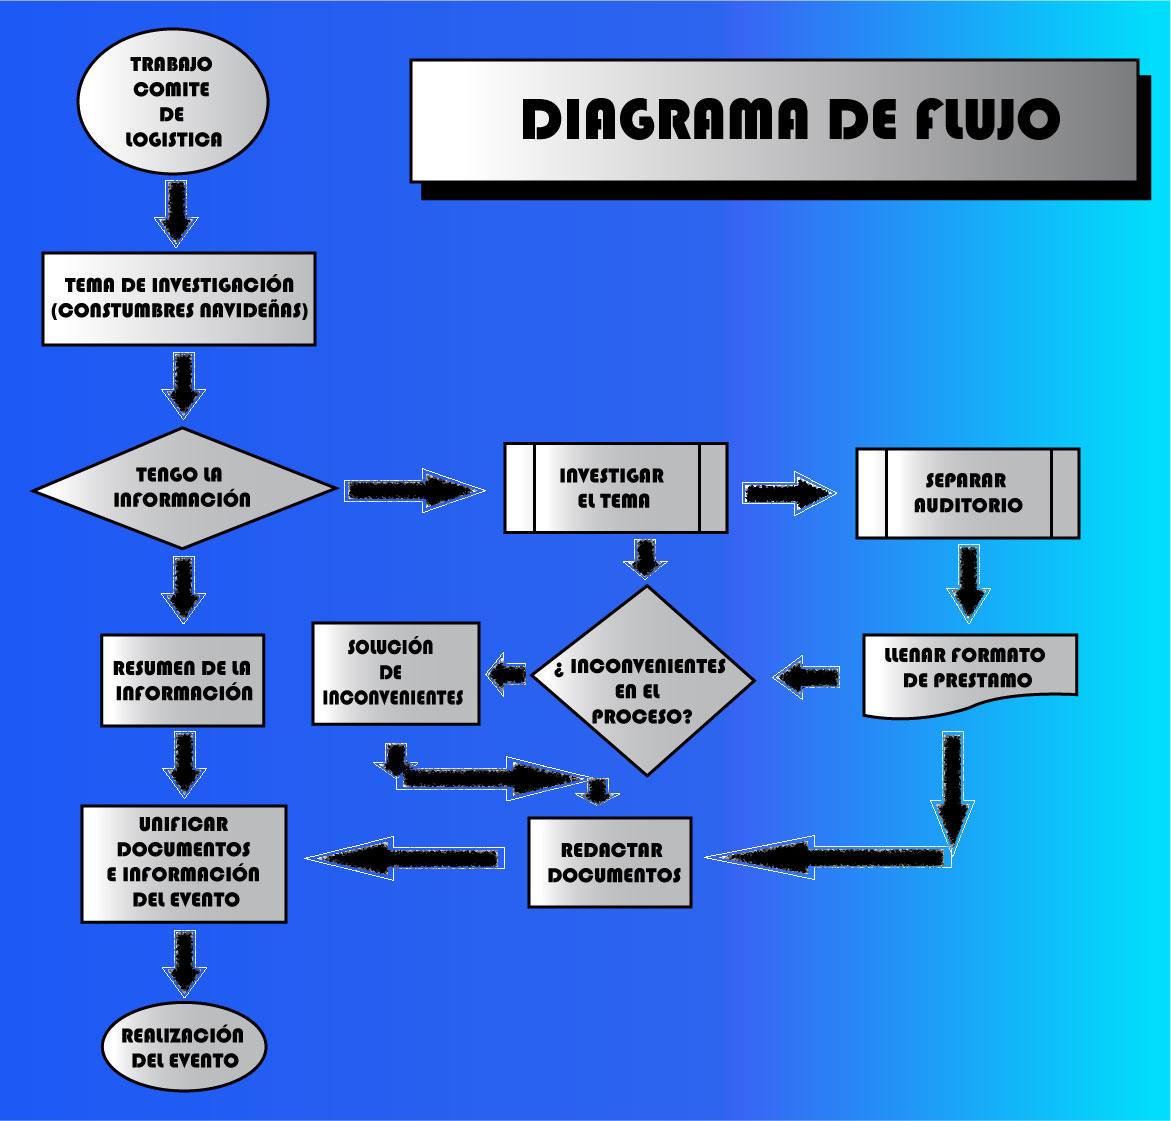 Comite logistica diagrama de flujo martes 16 de noviembre de 2010 ccuart Choice Image